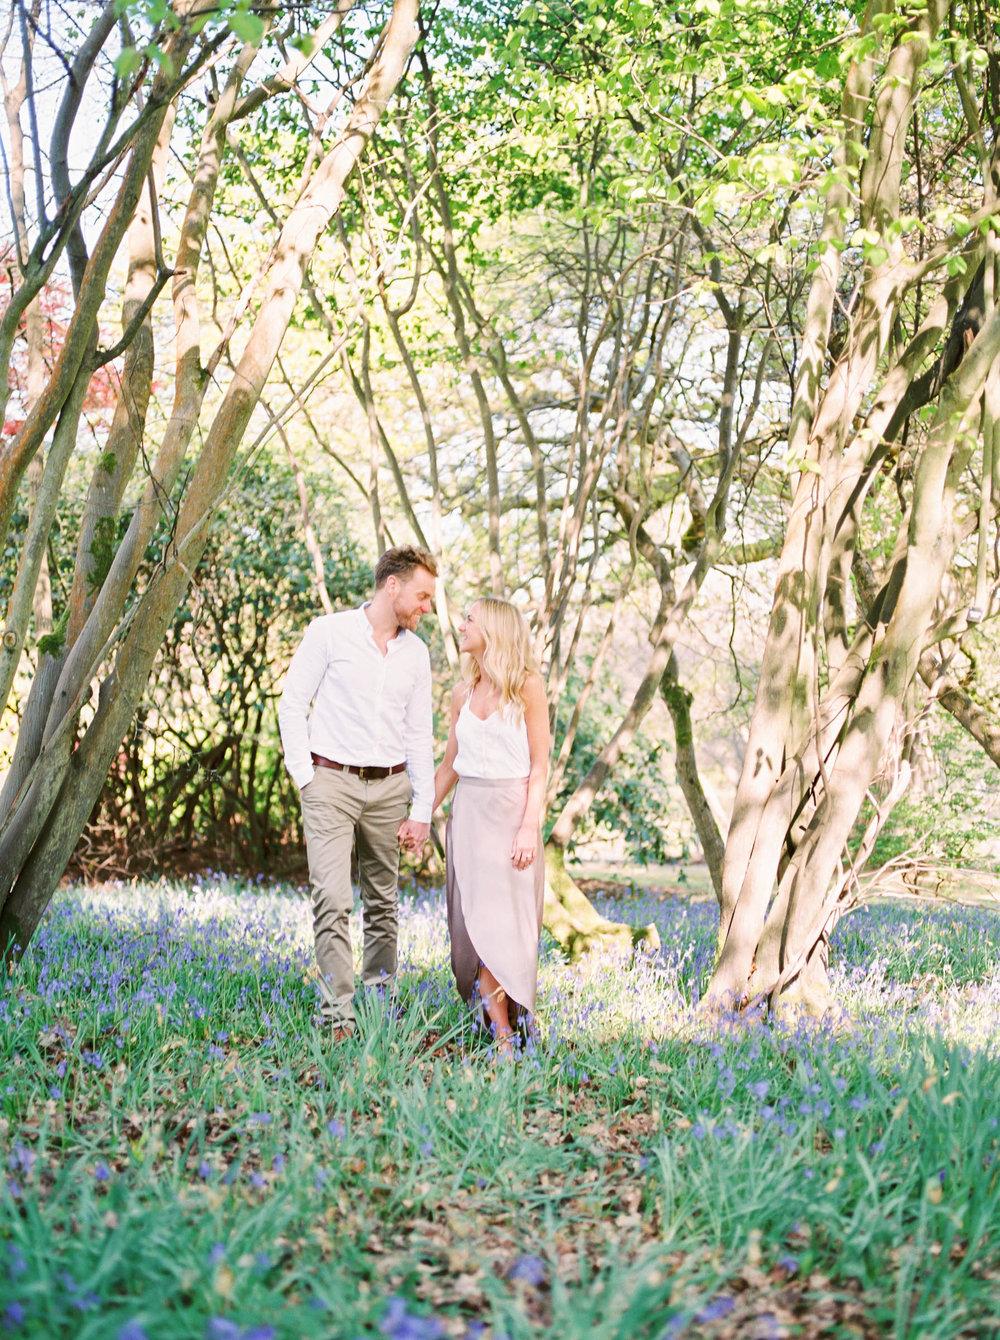 Amy O'Boyle Photography- Destination & UK Fine Art Film Wedding Photographer- Sheffield Park Garden National Trust Spring Engagement Shoot-19.jpg